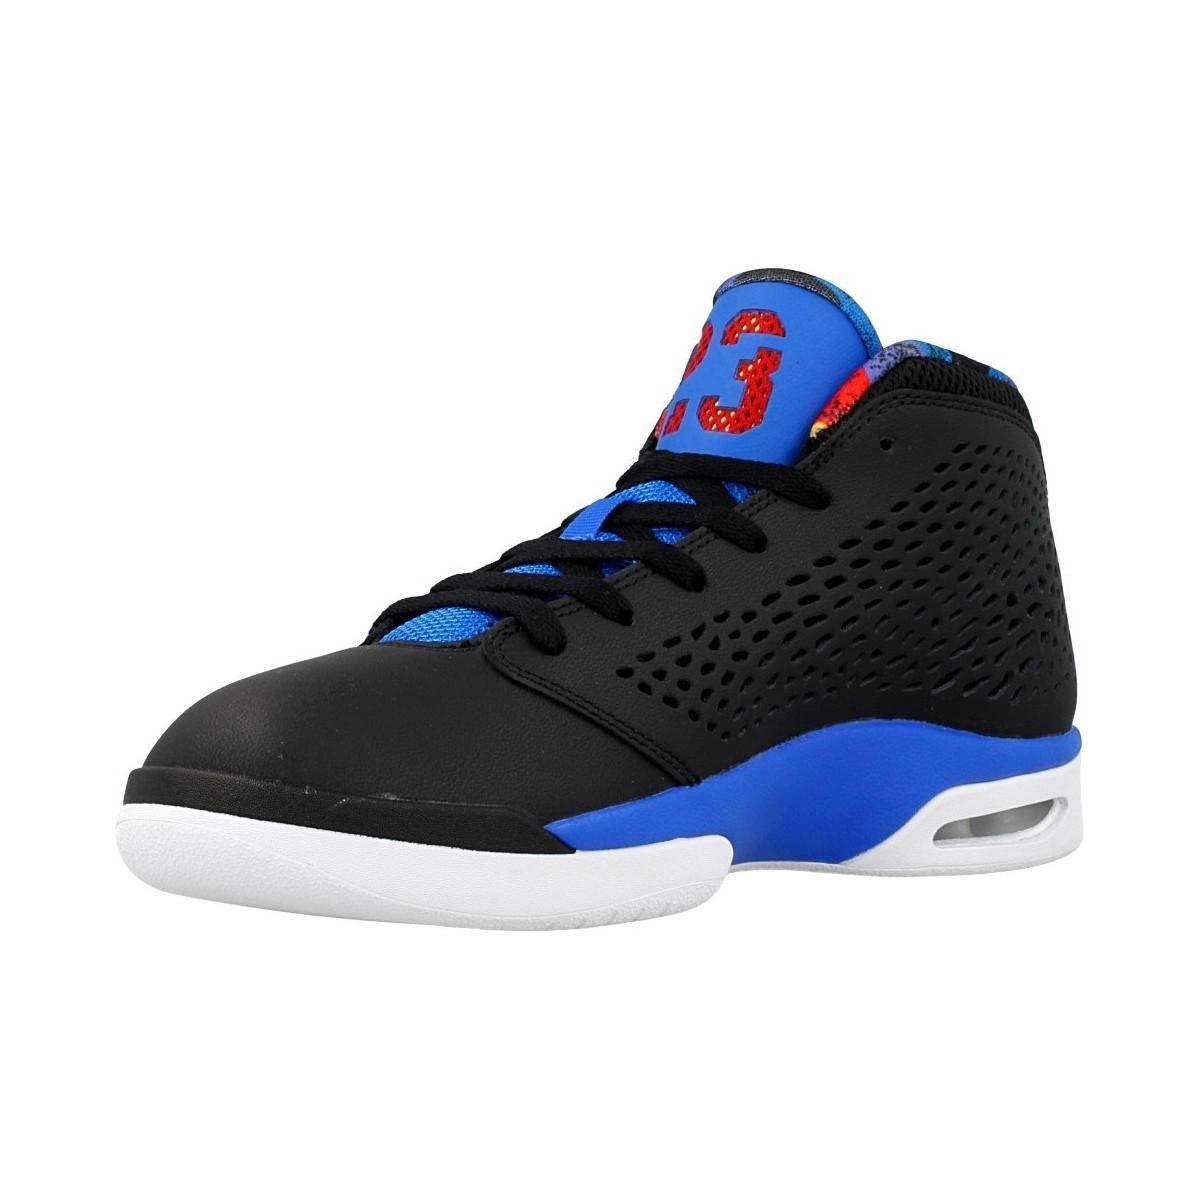 cba0a59935495b Nike Jordan Flight 2015 Men s Basketball Trainers (shoes) In Black ...